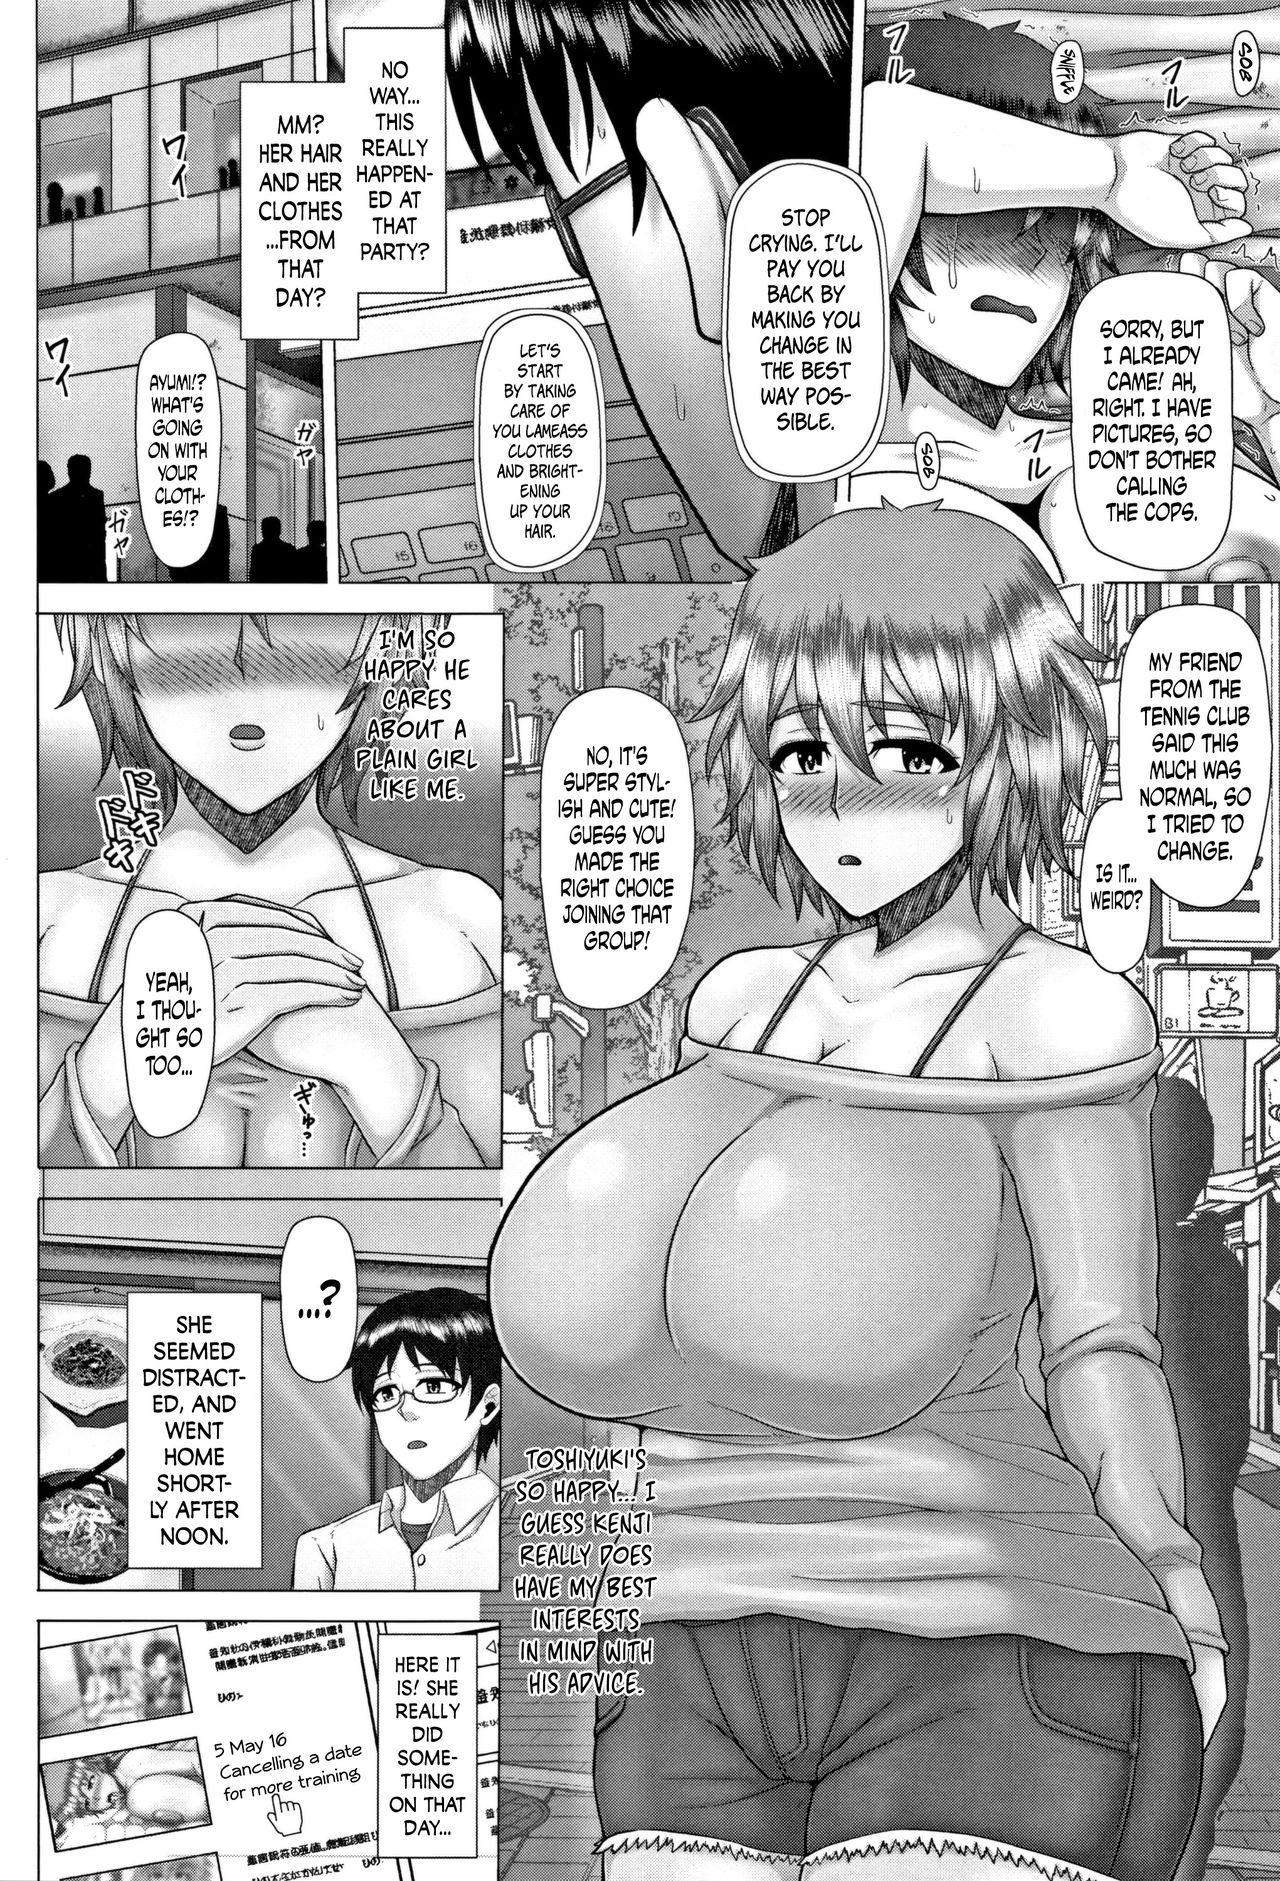 [Inoue Nanaki] Joushiki Daha! Kuro Gal Bitch-ka Seikatsu Ch. 1-3, 5-8 [English] [Dark Mac + N04h] 9